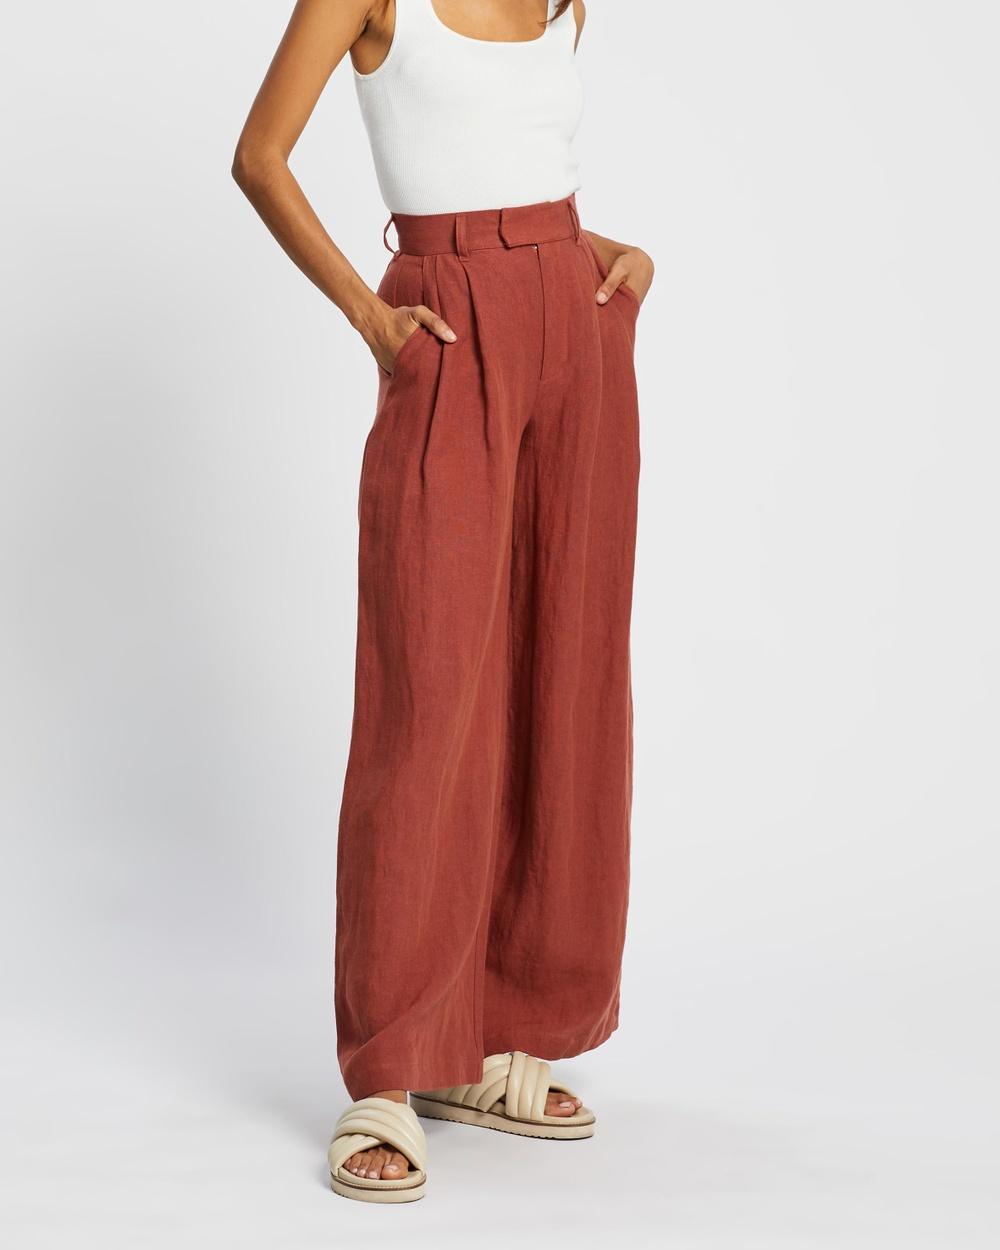 AERE Linen Wide Leg Pants Rust